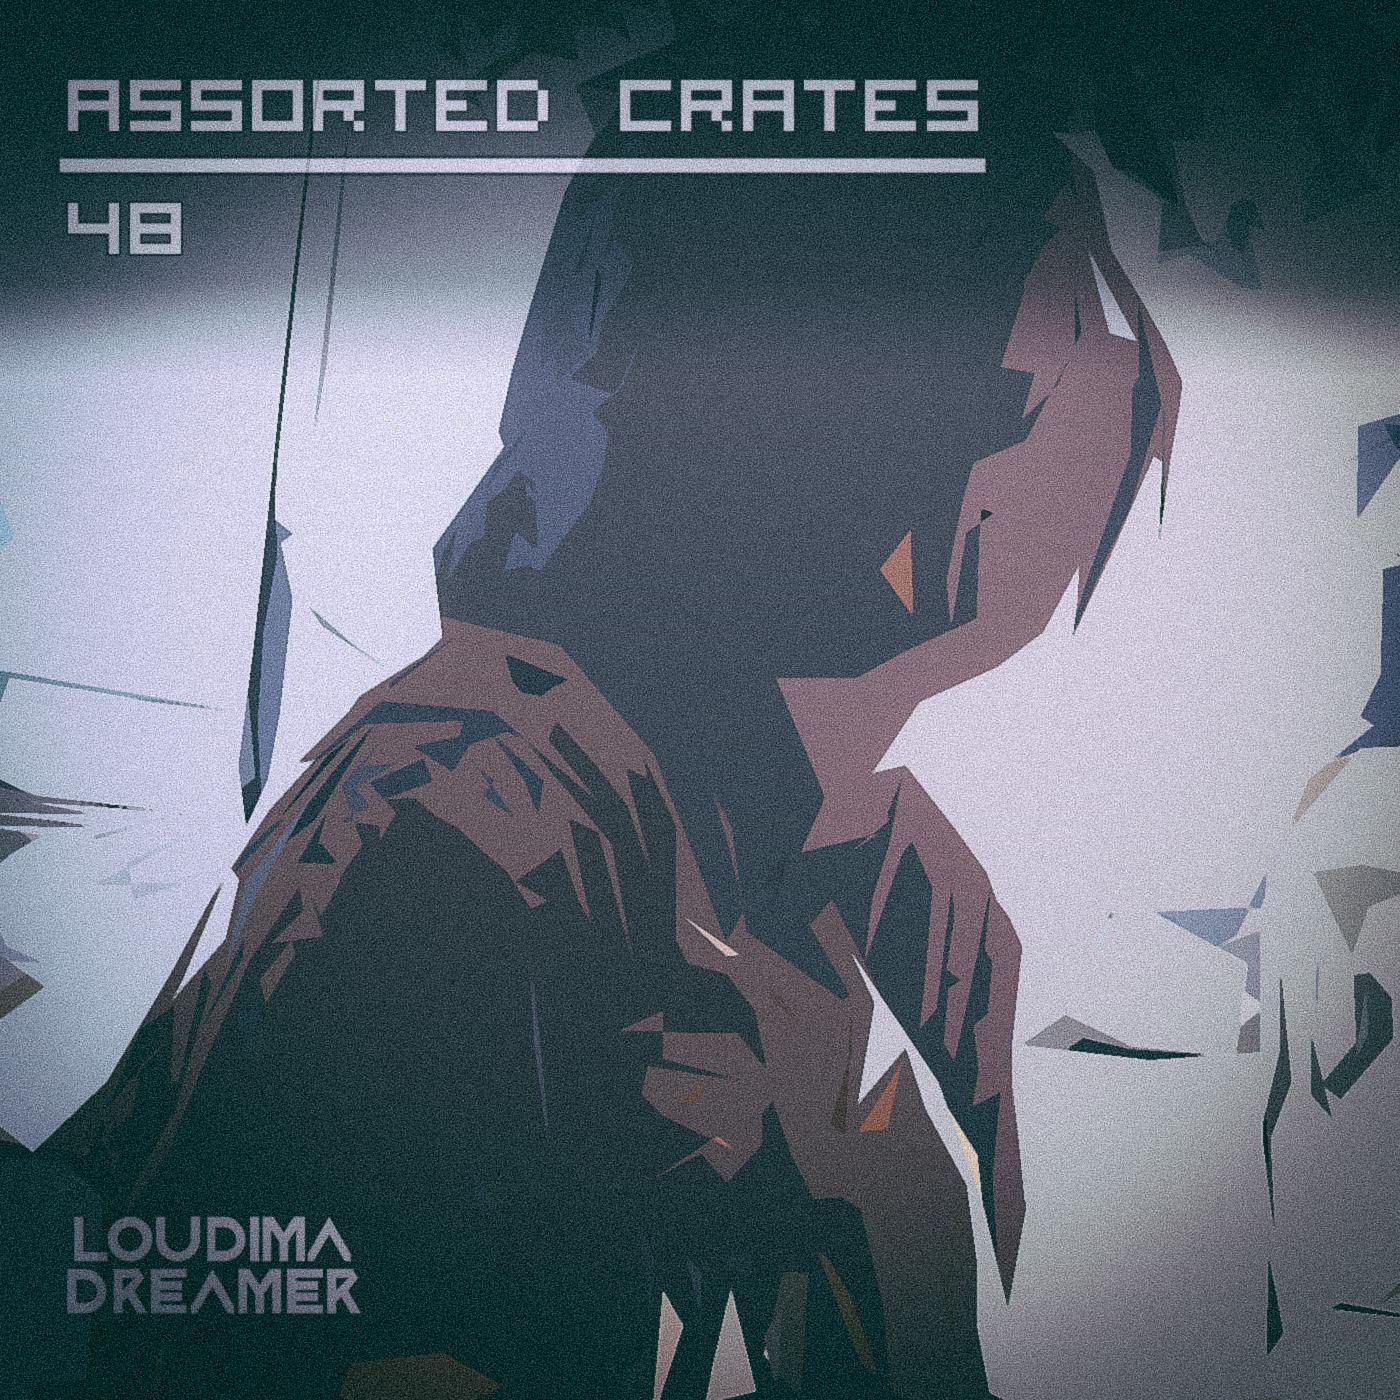 Assorted Crates #48